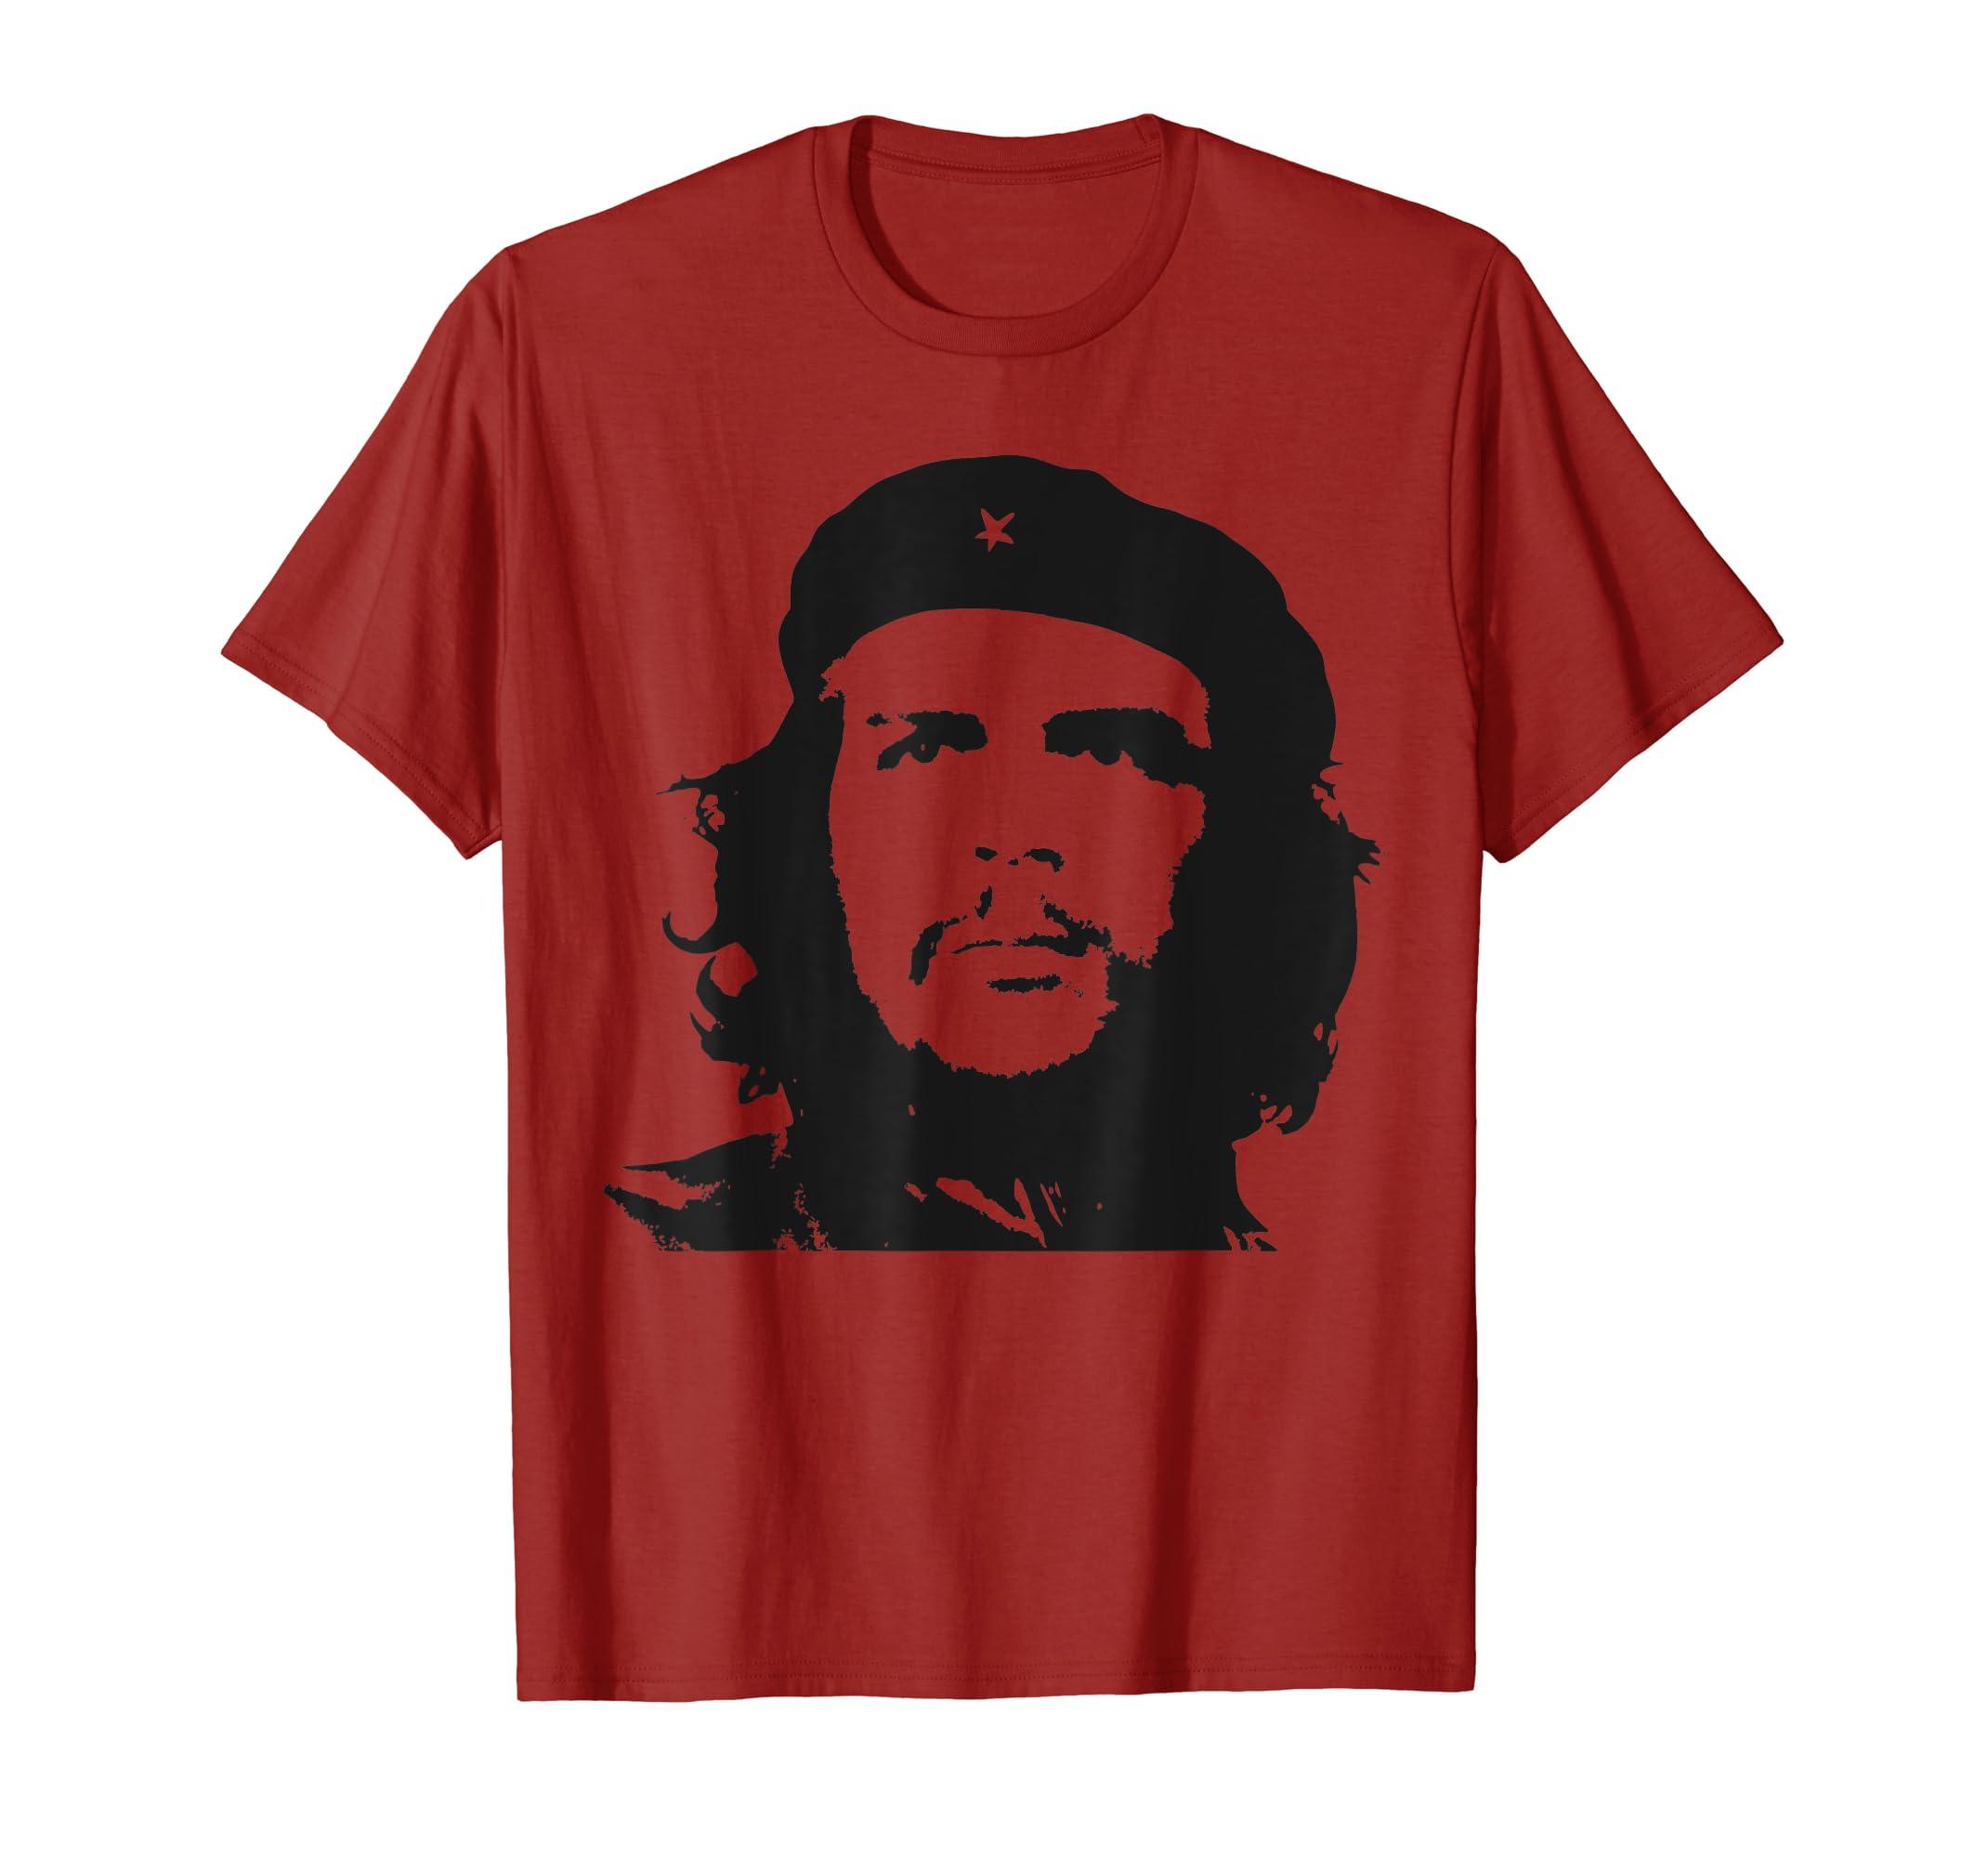 Amazon.com  Che Guevara Revolution T Shirt  Clothing 29d5a5130cb9